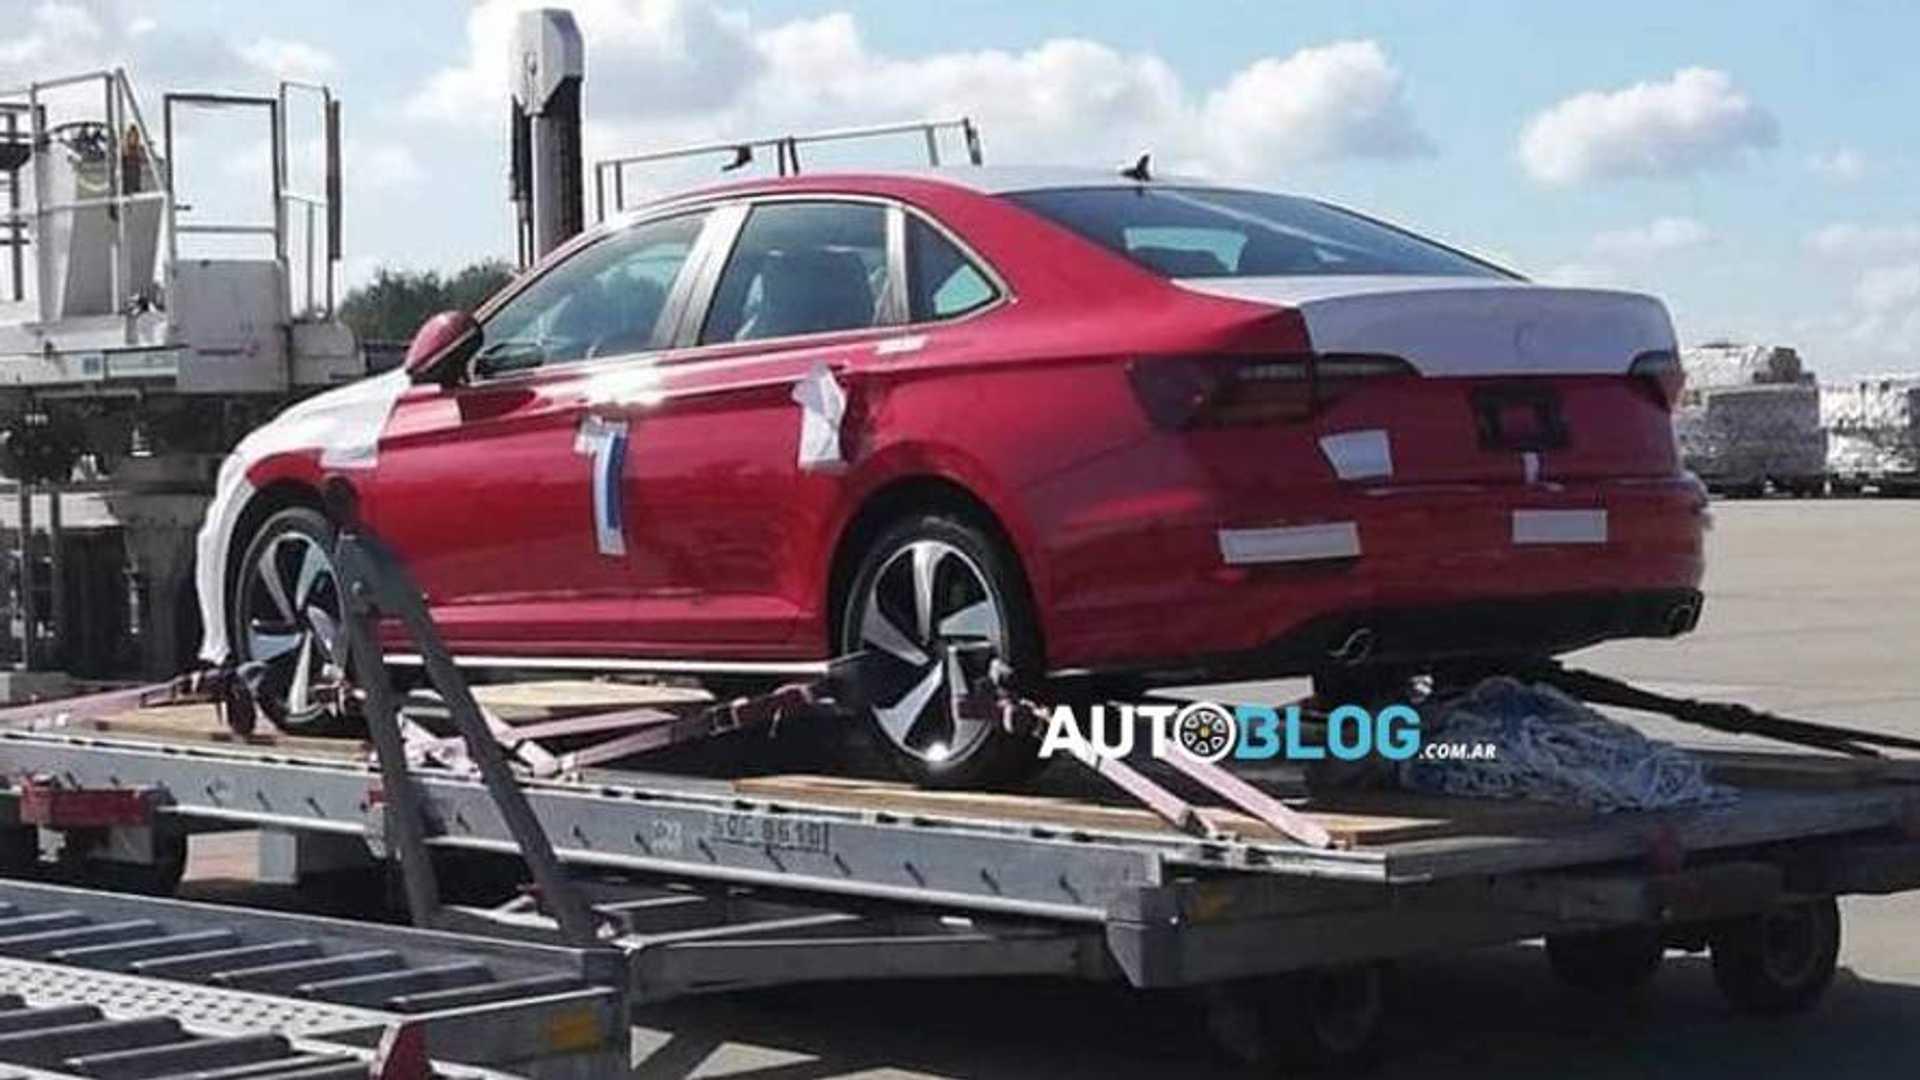 new volkswagen jetta gli 2 0 turbo